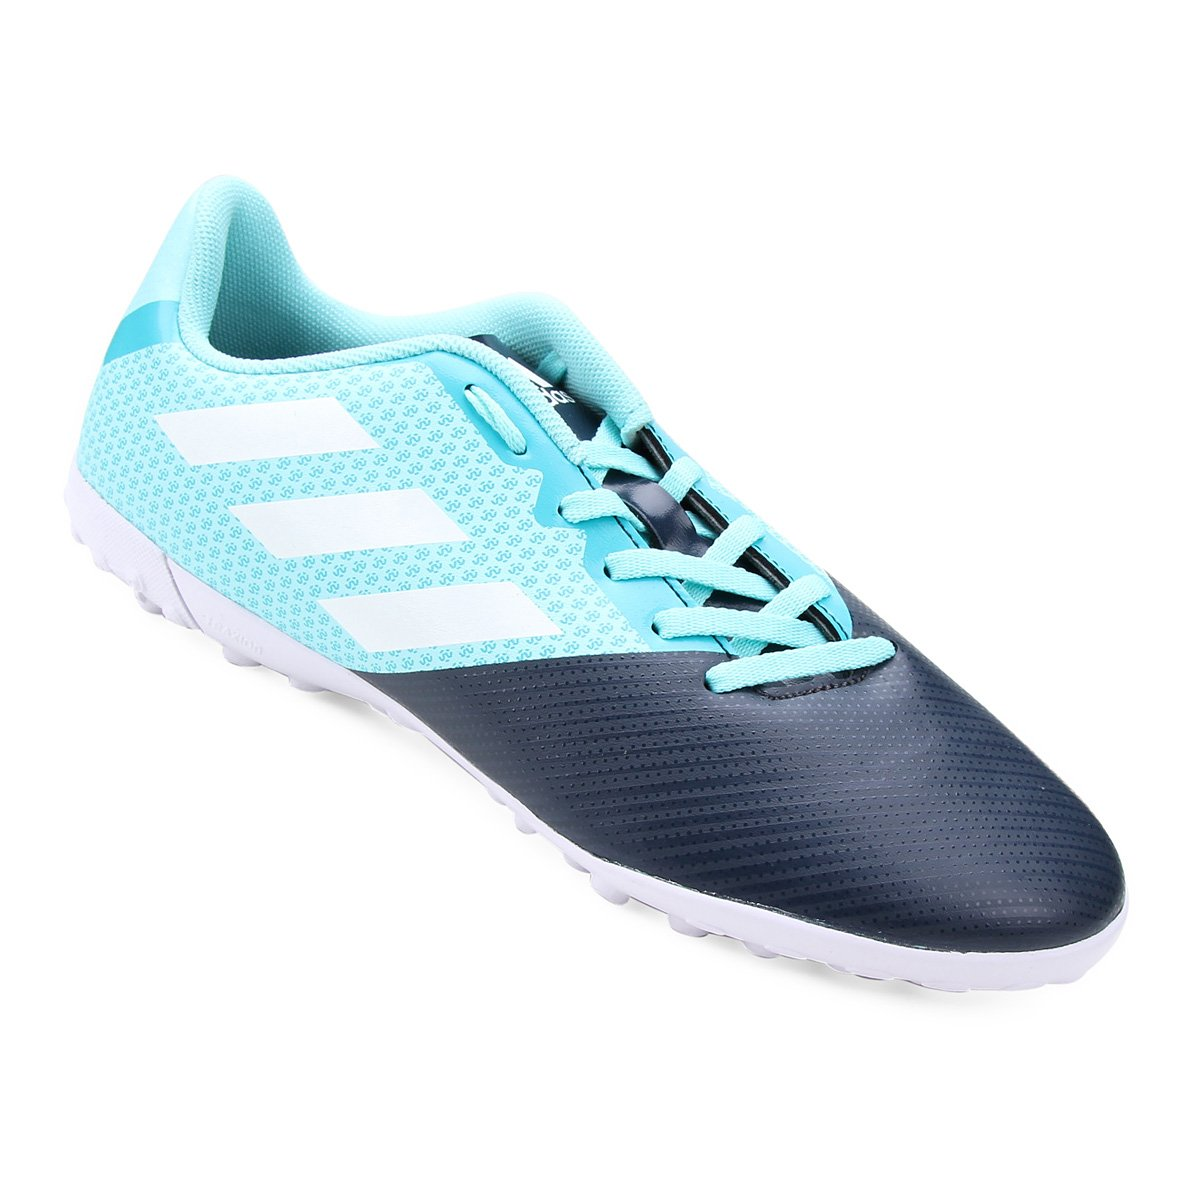 Chuteira Society Adidas Artilheira 17 TF 1c8383bdaf0ac